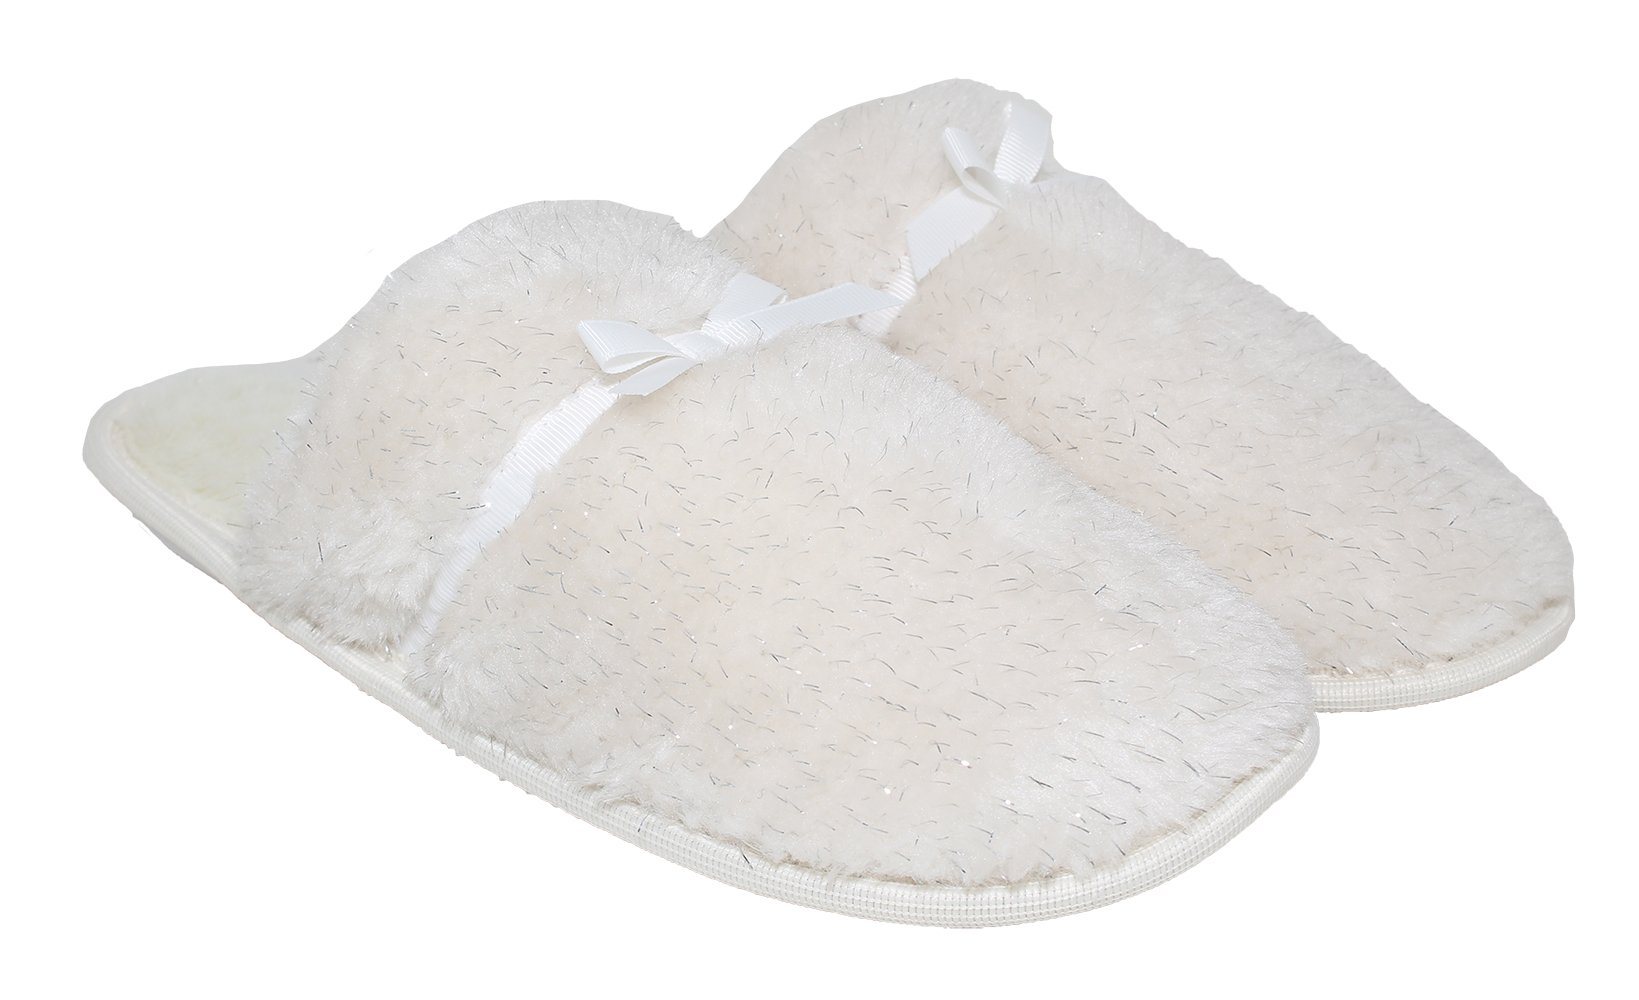 Blue Star Women's Comfort Memory Foam Sherpa House Slippers w Slip-Resistant Rubber Bottom Sole |Indoor/Outdoor |Anti-Skid